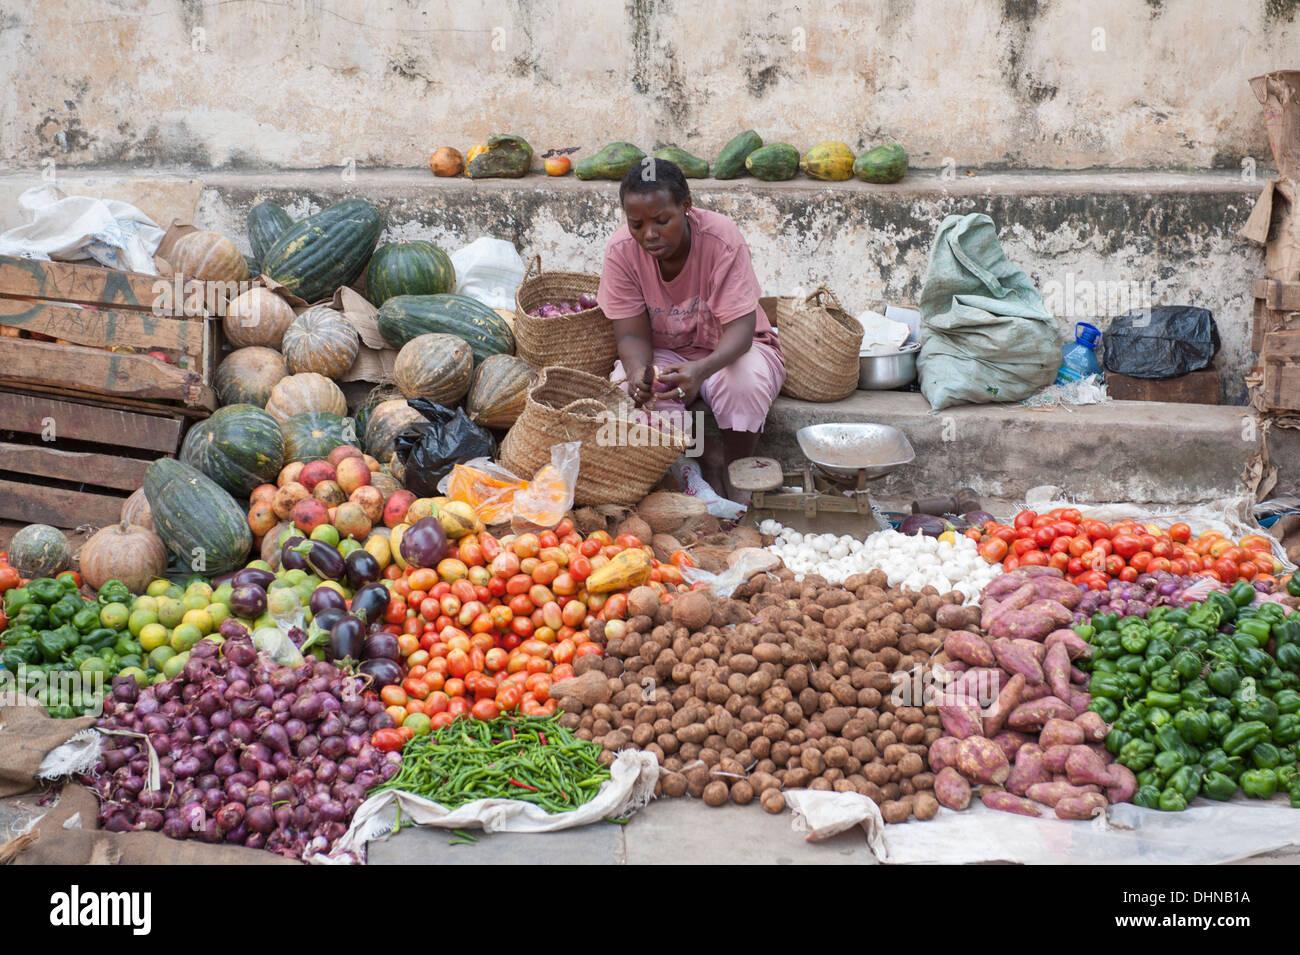 The market of Lamu Town, Kenya Stock Photo